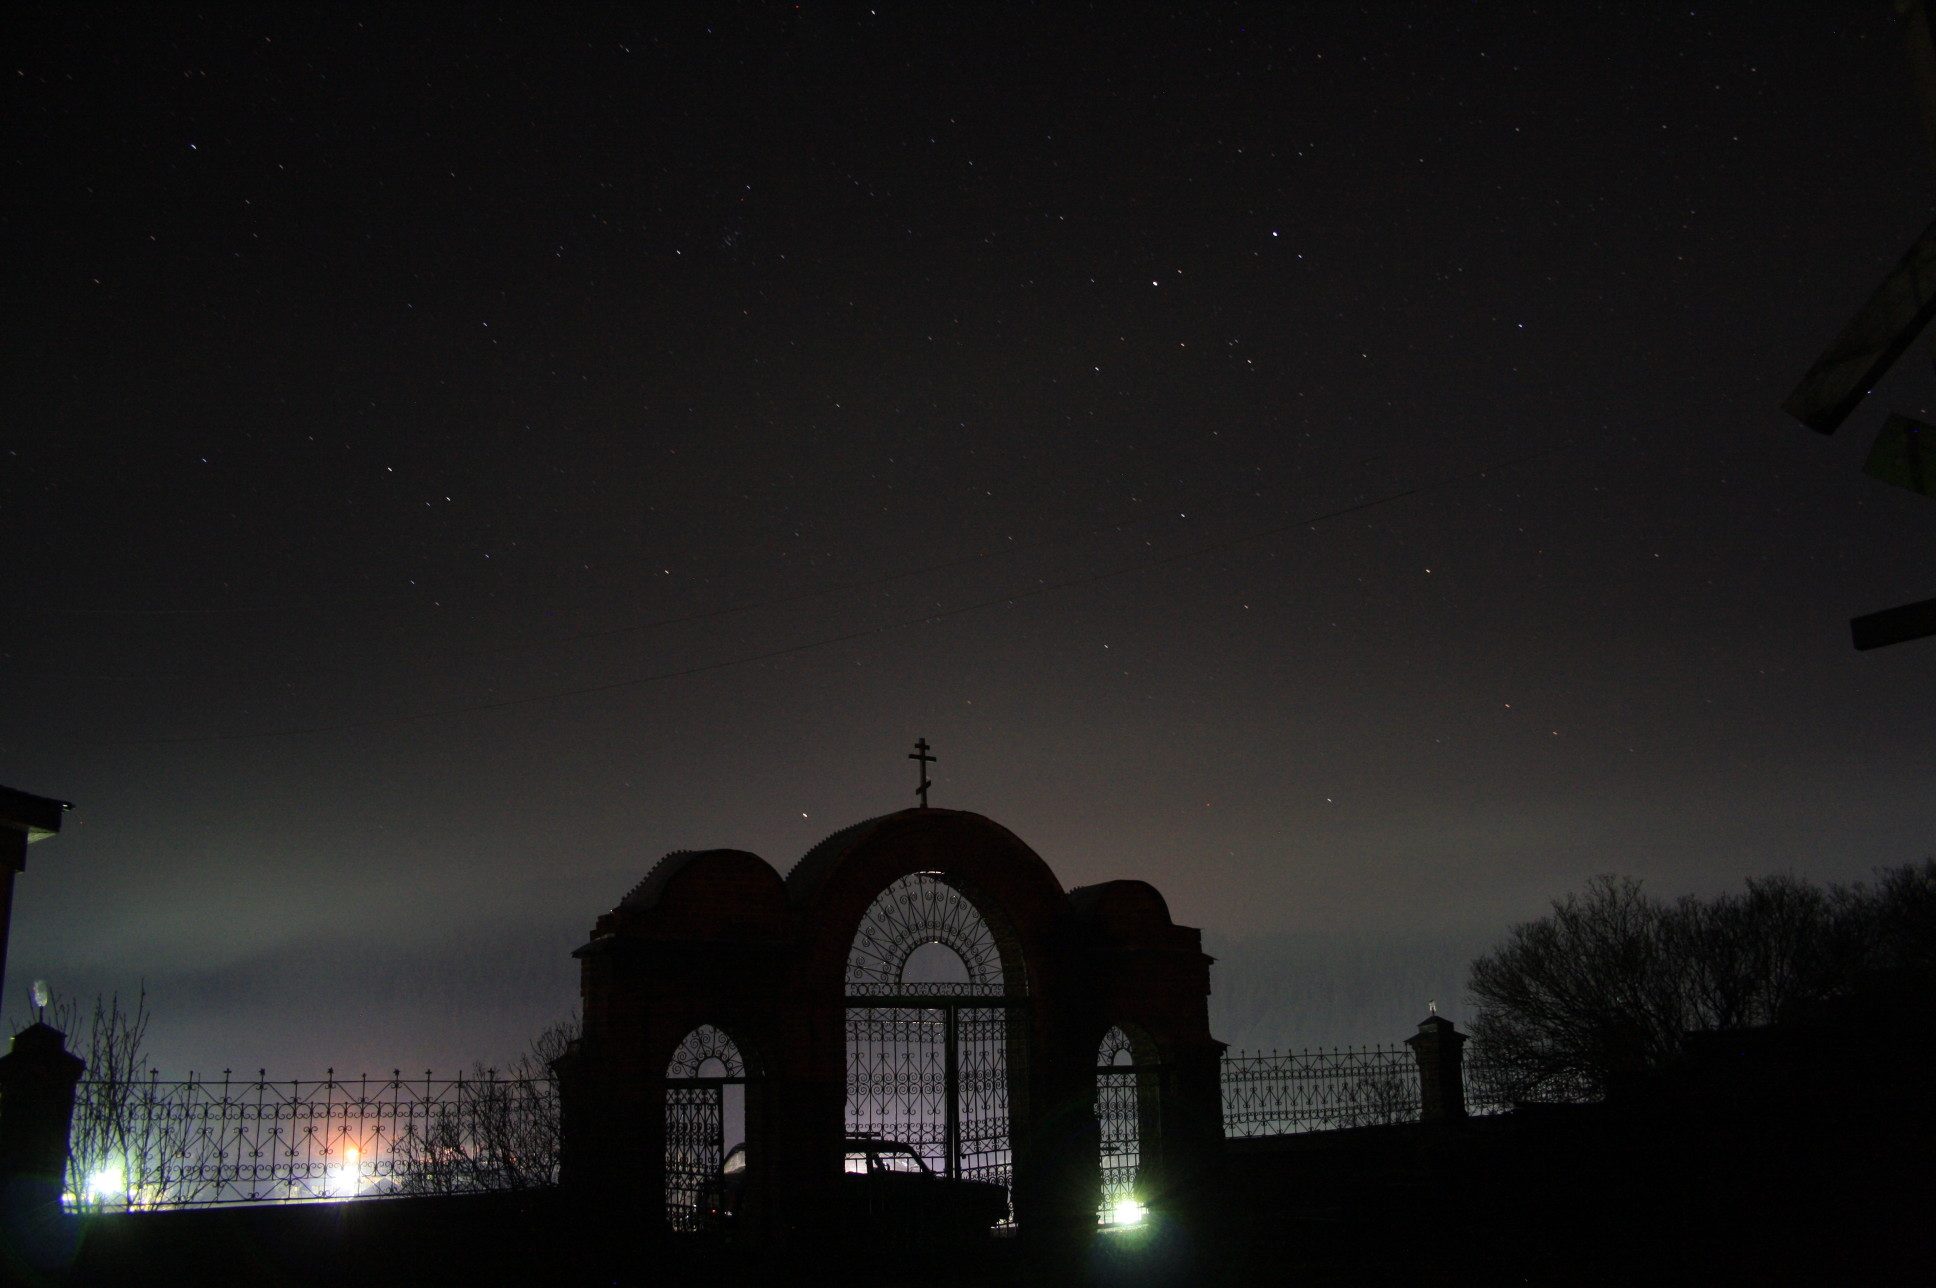 Кага Пасха Ночное небо над селом